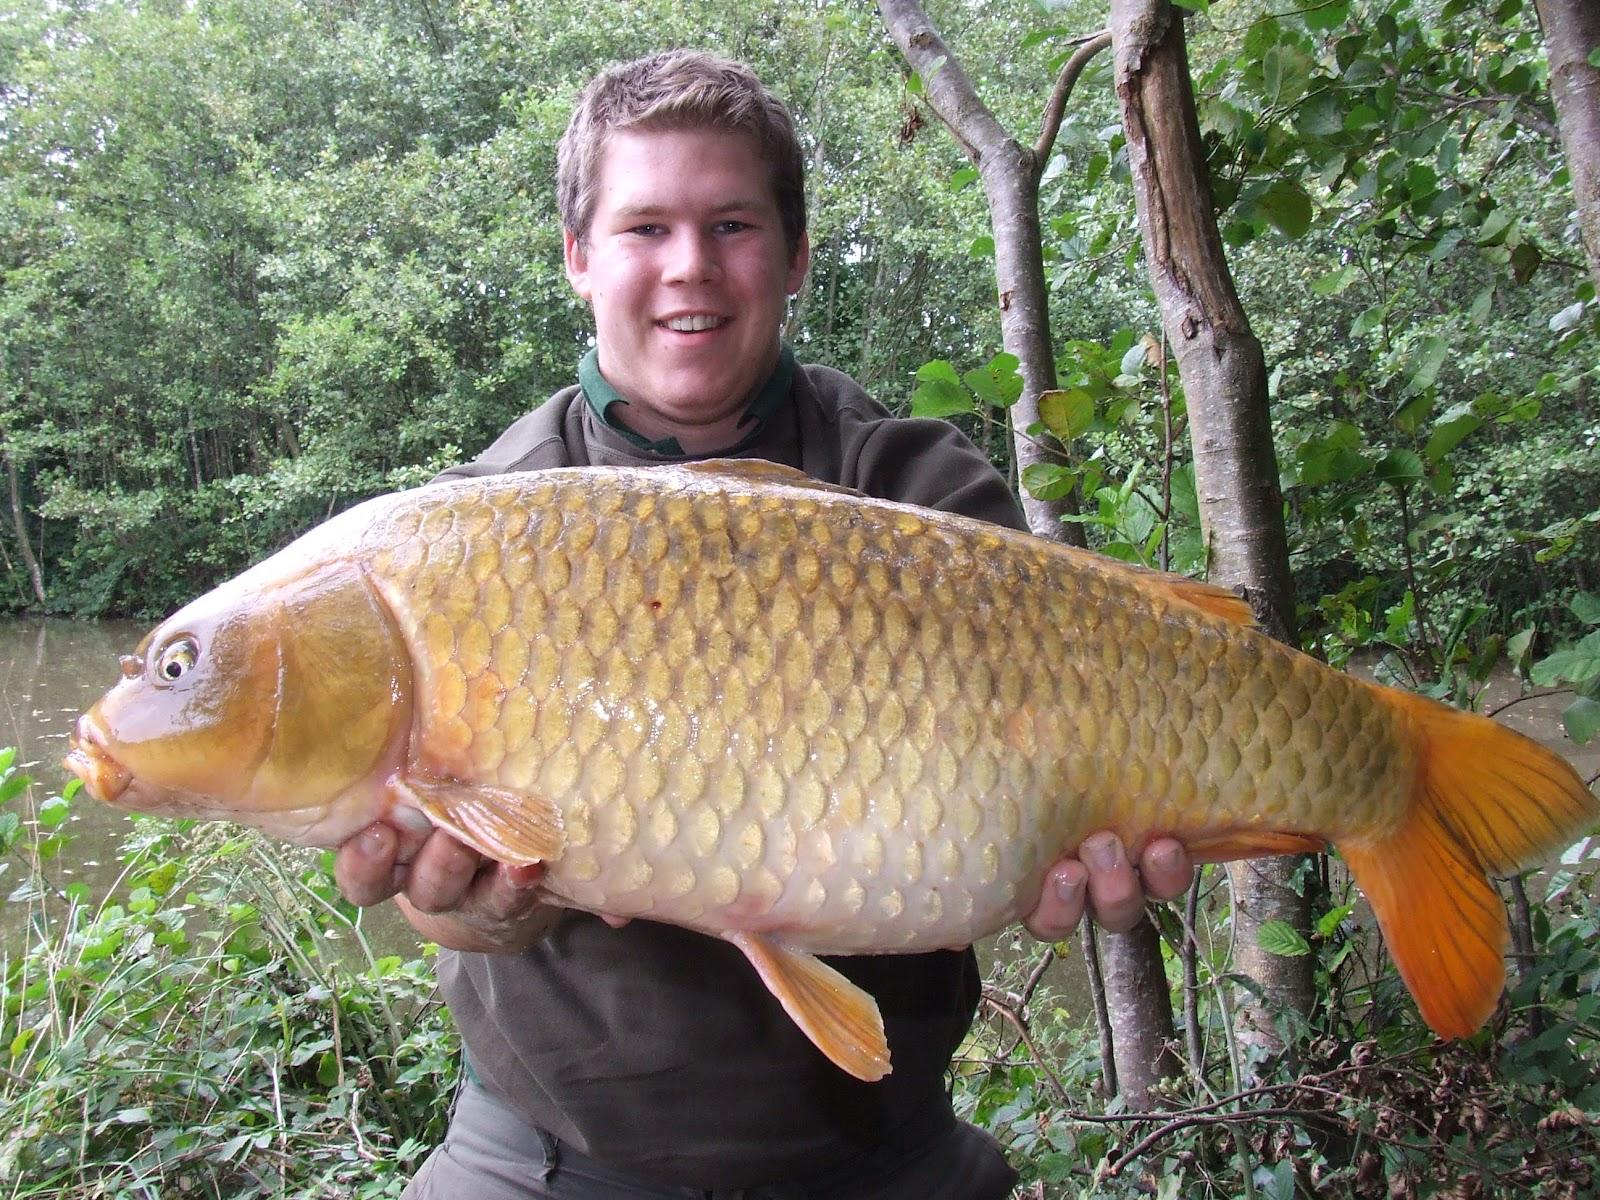 Resep Umpan Ikan Mas Besar Terbaik Dan Jitu ~ Resep Umpan